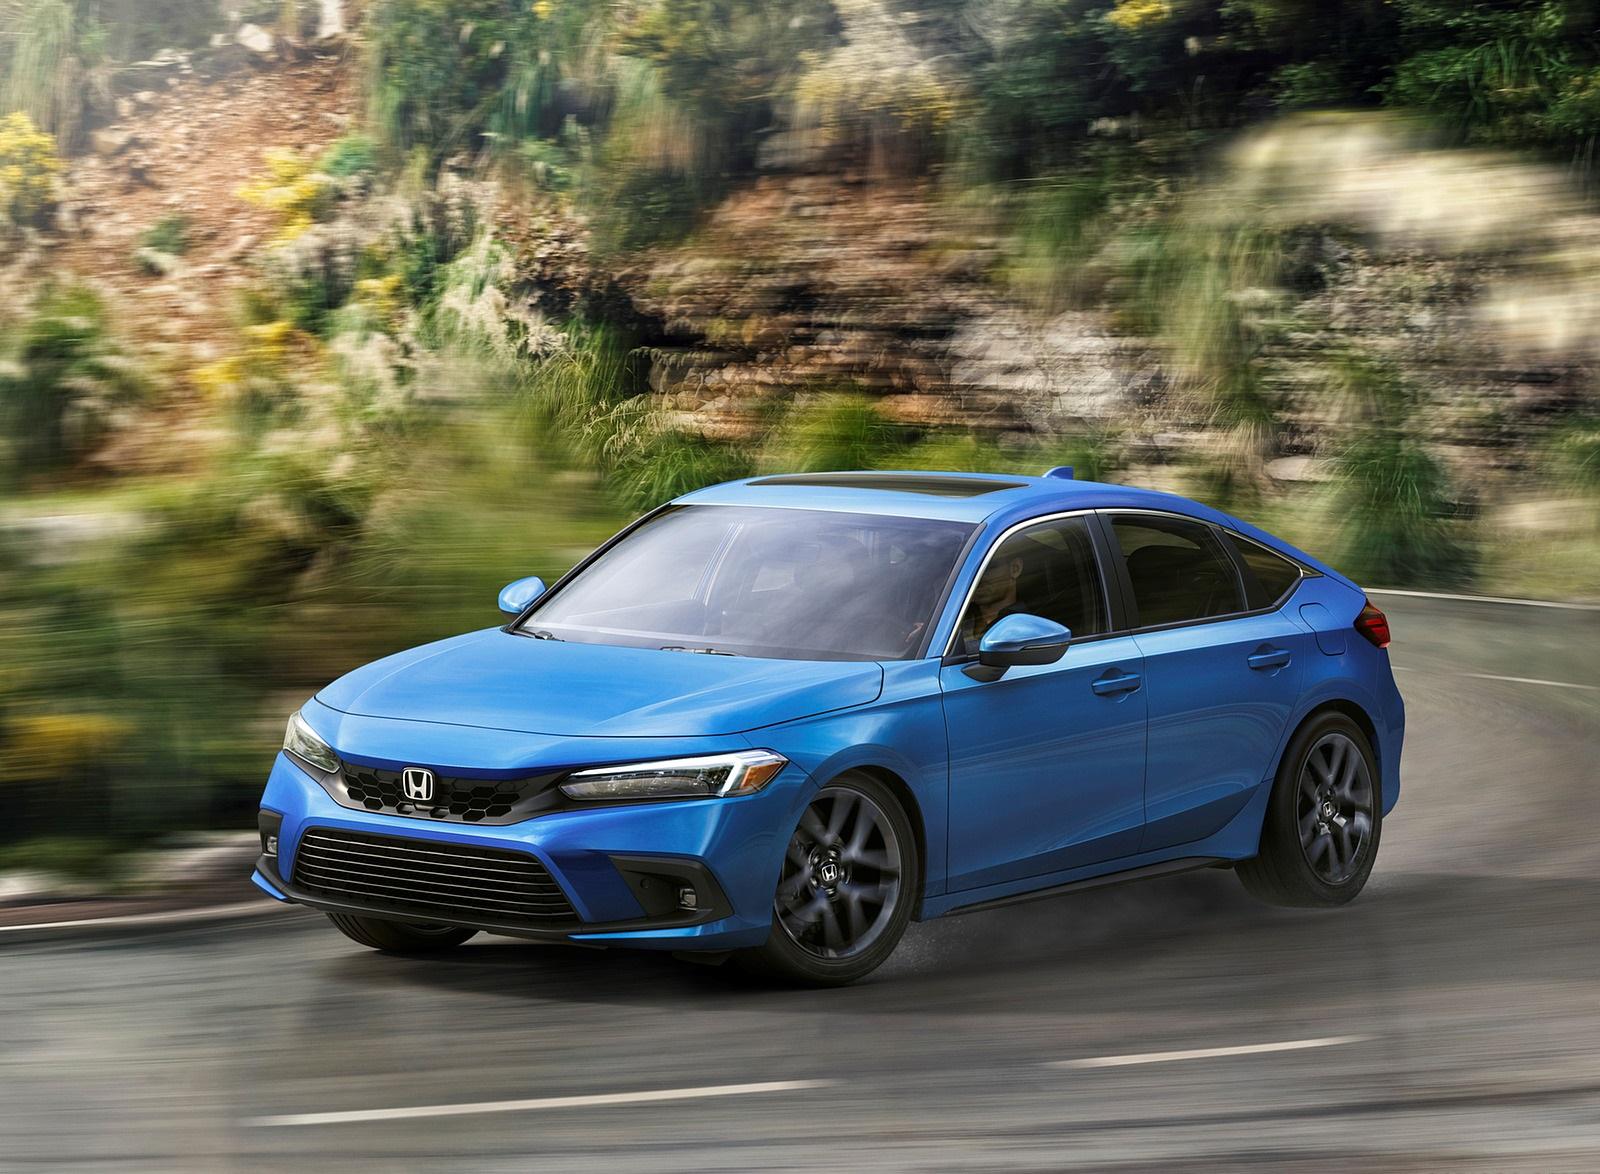 2022 Honda Civic Hatchback Front Three-Quarter Wallpapers (1)